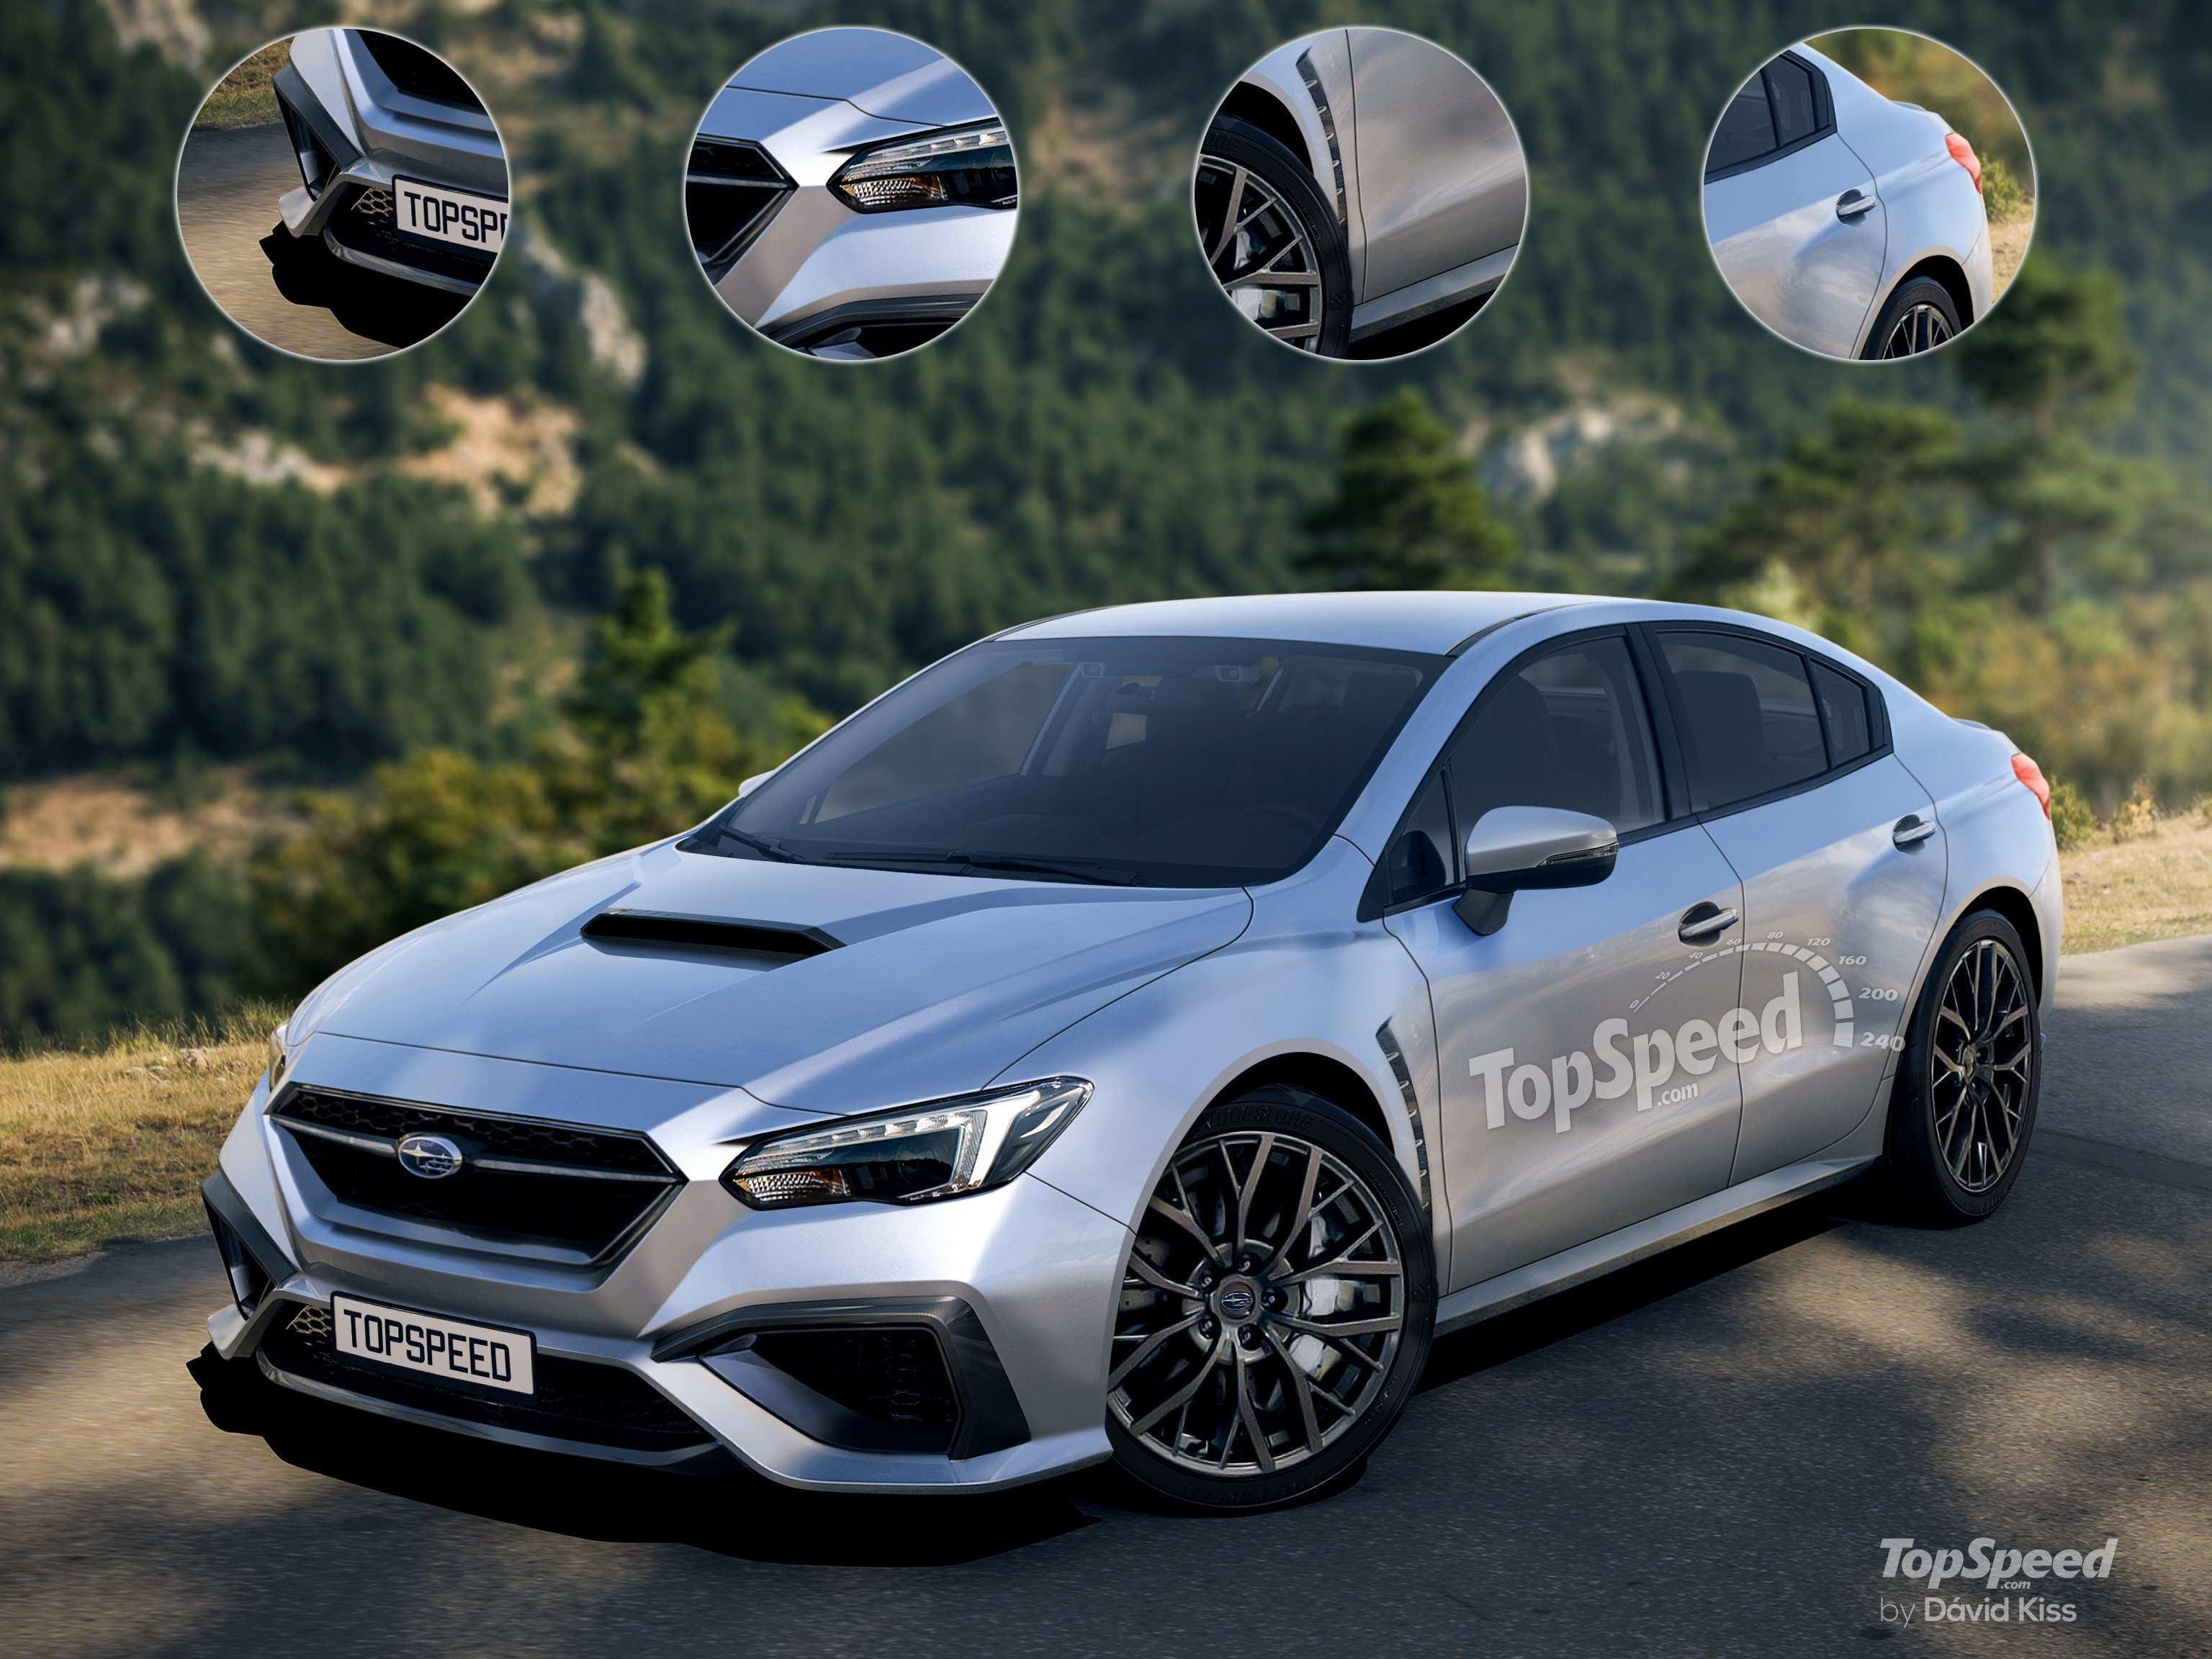 92 New Subaru Lineup 2020 Specs by Subaru Lineup 2020